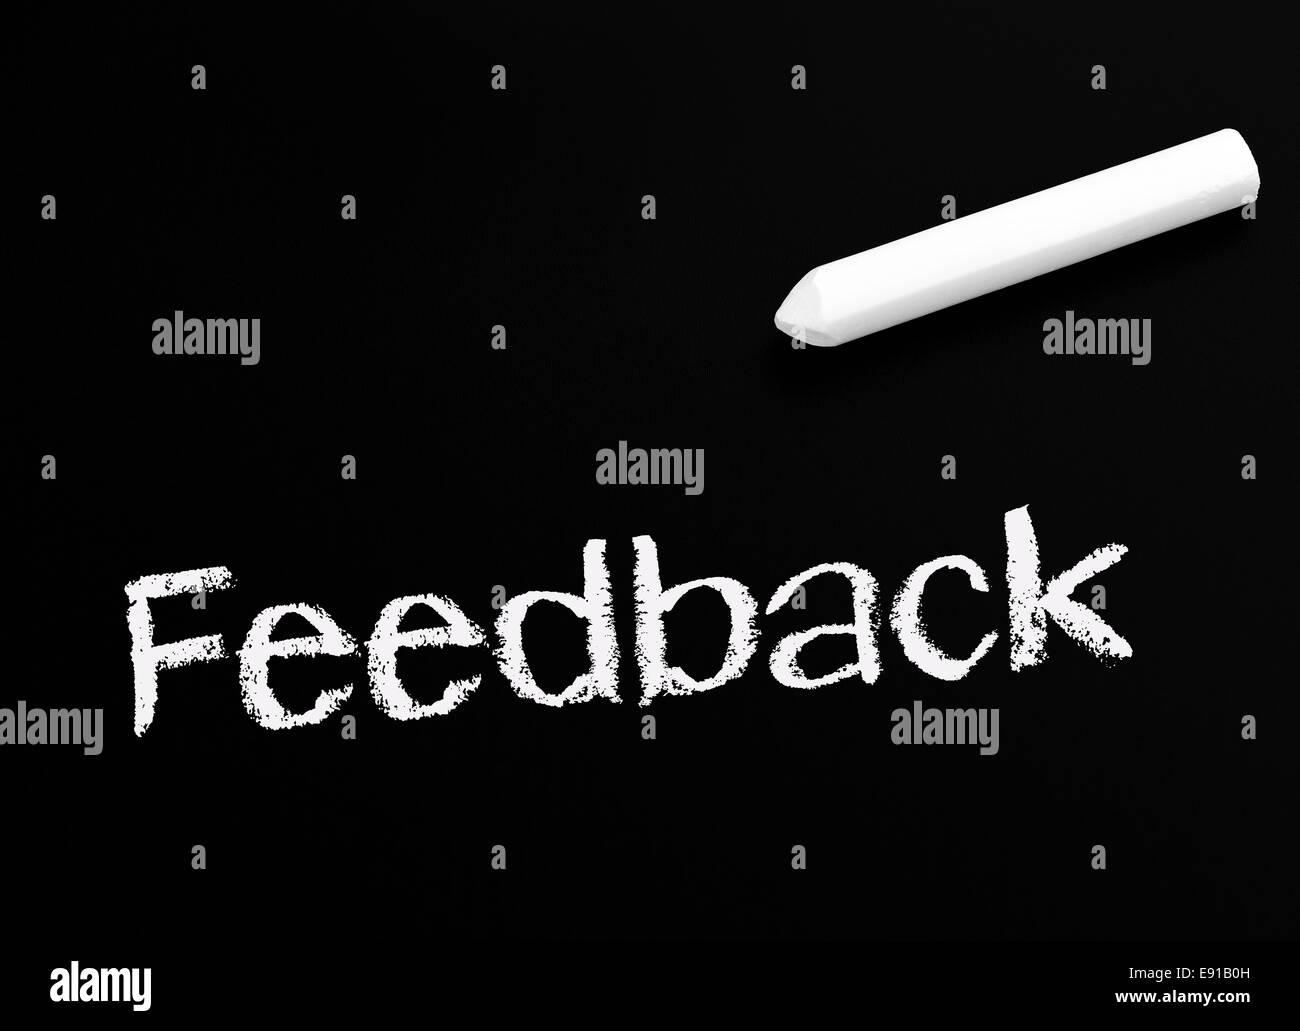 Feedback - Business Concept Stock Photo